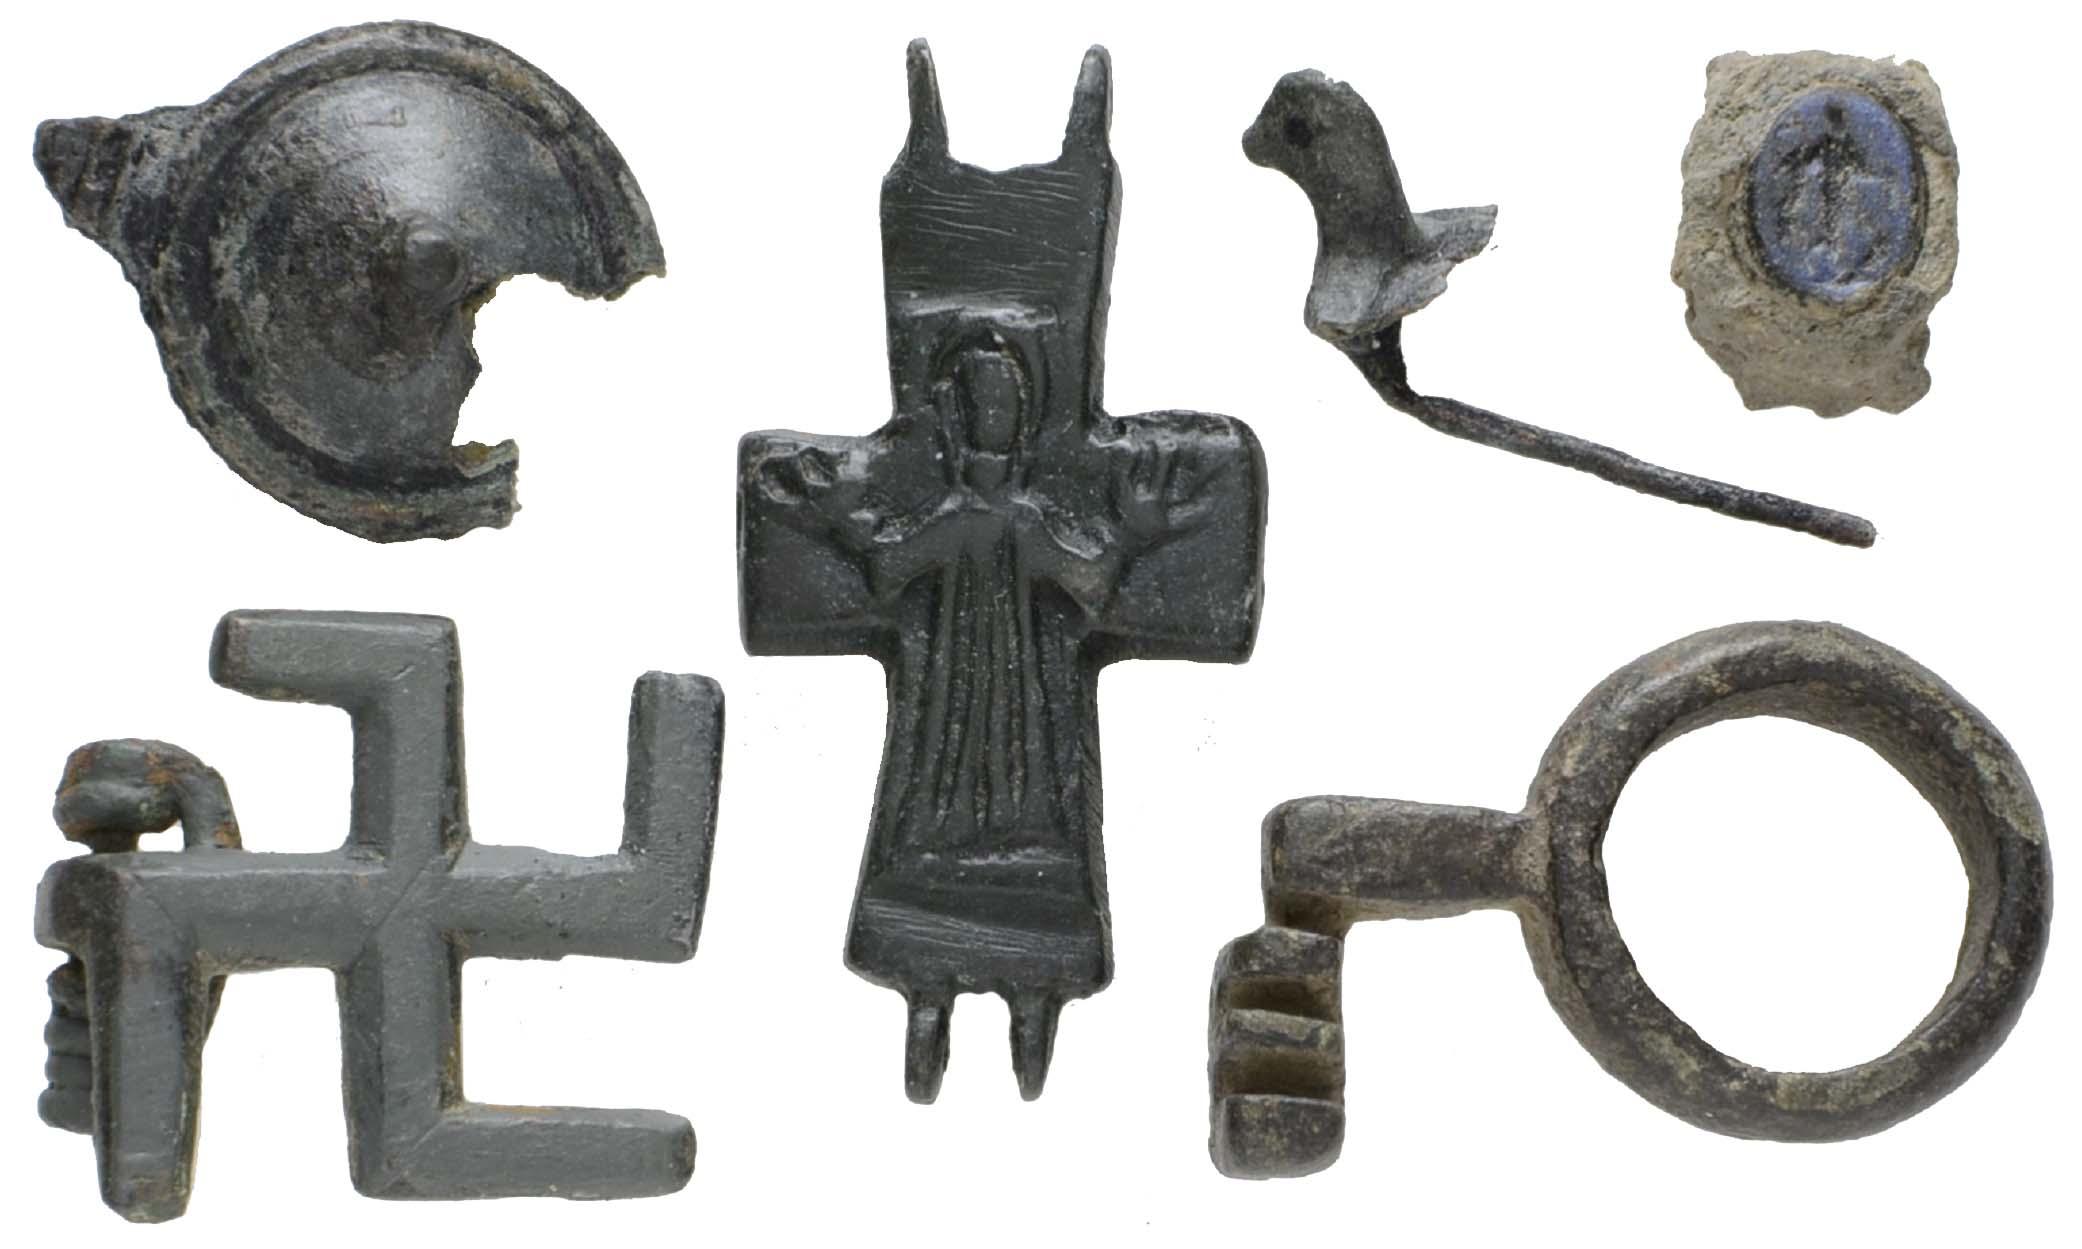 Lot 446 - Antike Antike Objekte  -  Auktionshaus Ulrich Felzmann GmbH & Co. KG Auction 169